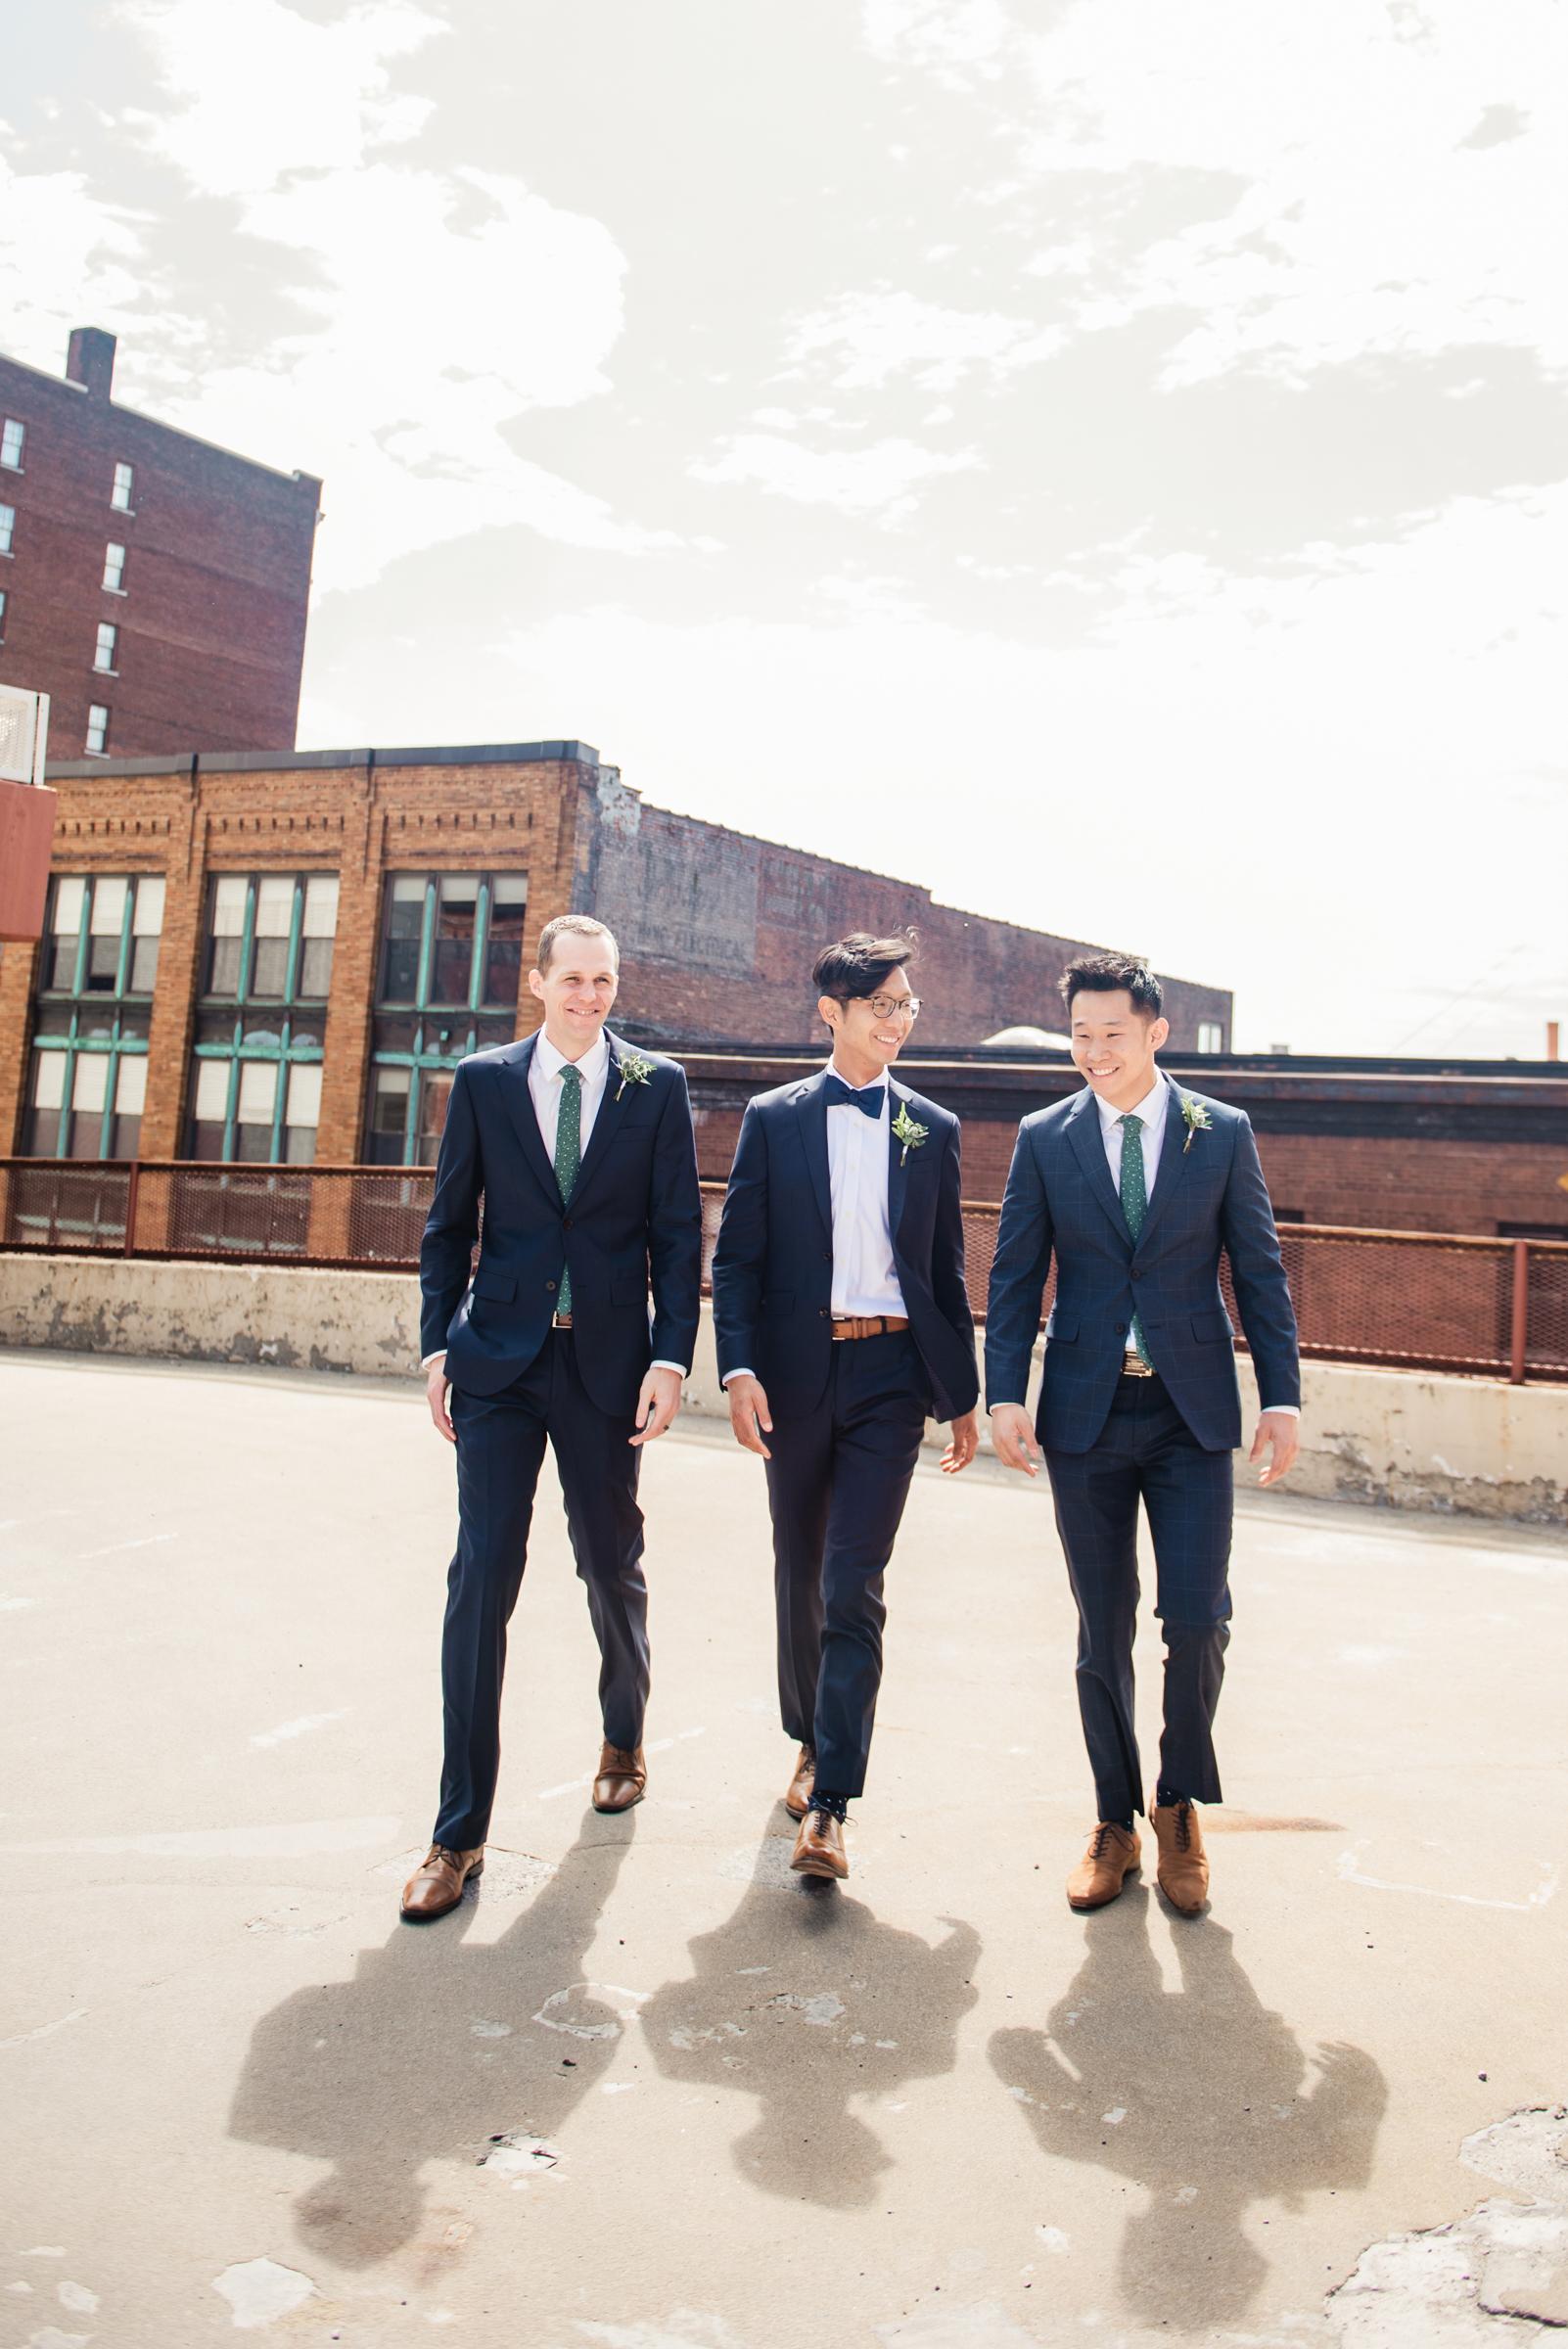 SKY_Armory_Syracuse_Wedding_JILL_STUDIO_Rochester_NY_Photographer_DSC_5512.jpg